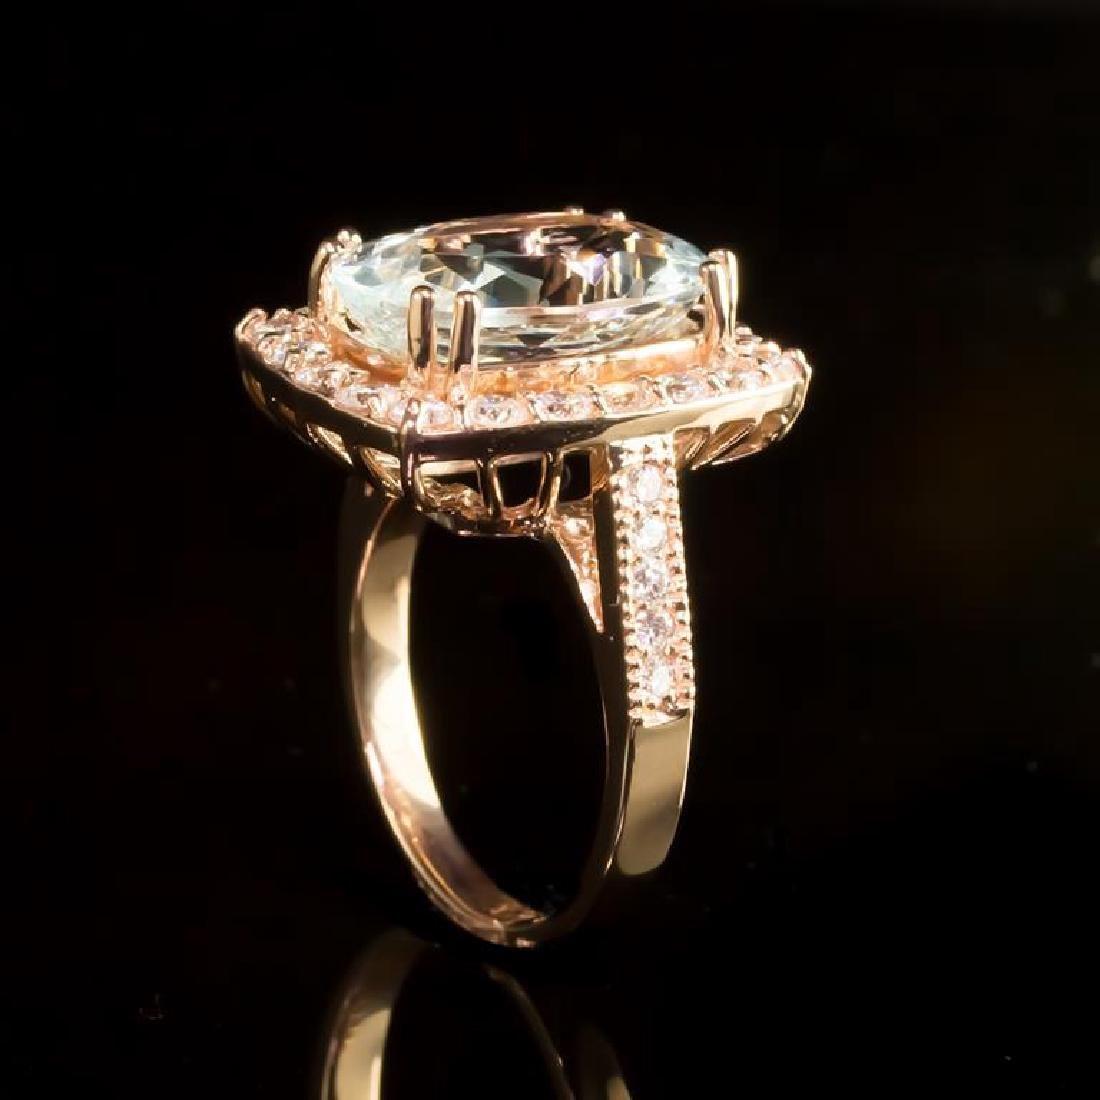 14K Gold 6.50ct Aquamarine 1.41ct Diamond Ring - 3